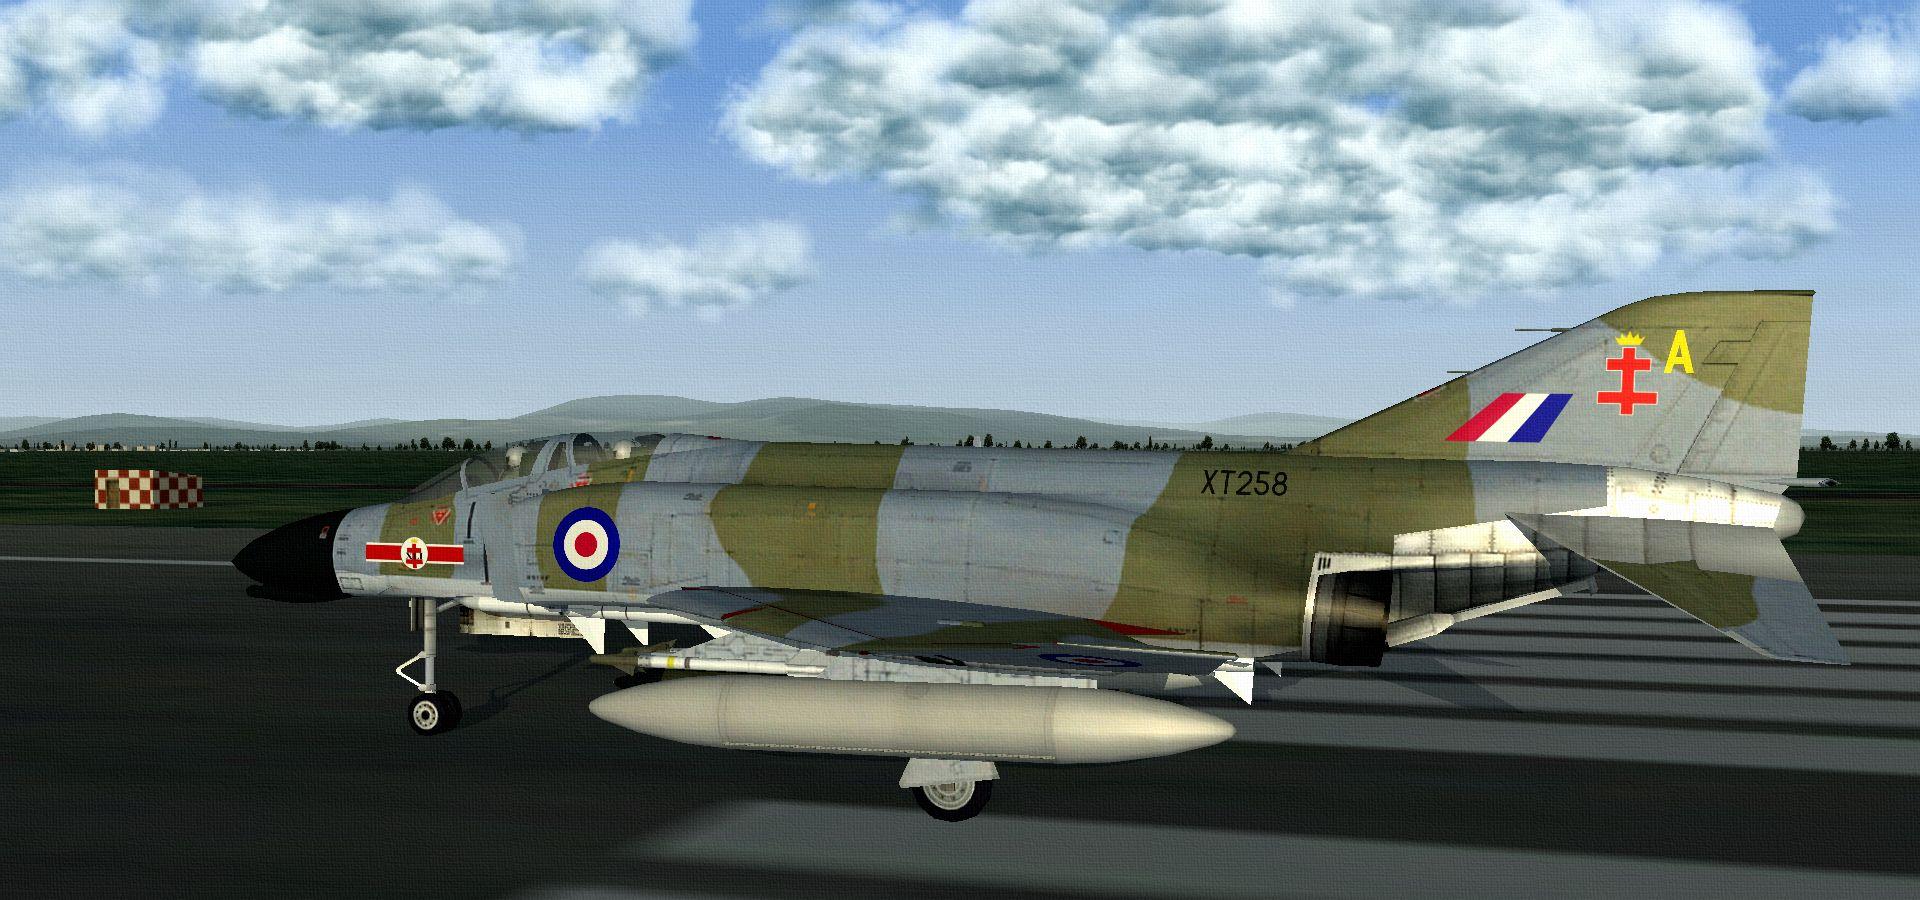 RAF%20PHANTOM%20FG2.02_zps8pi2ojs1.jpg